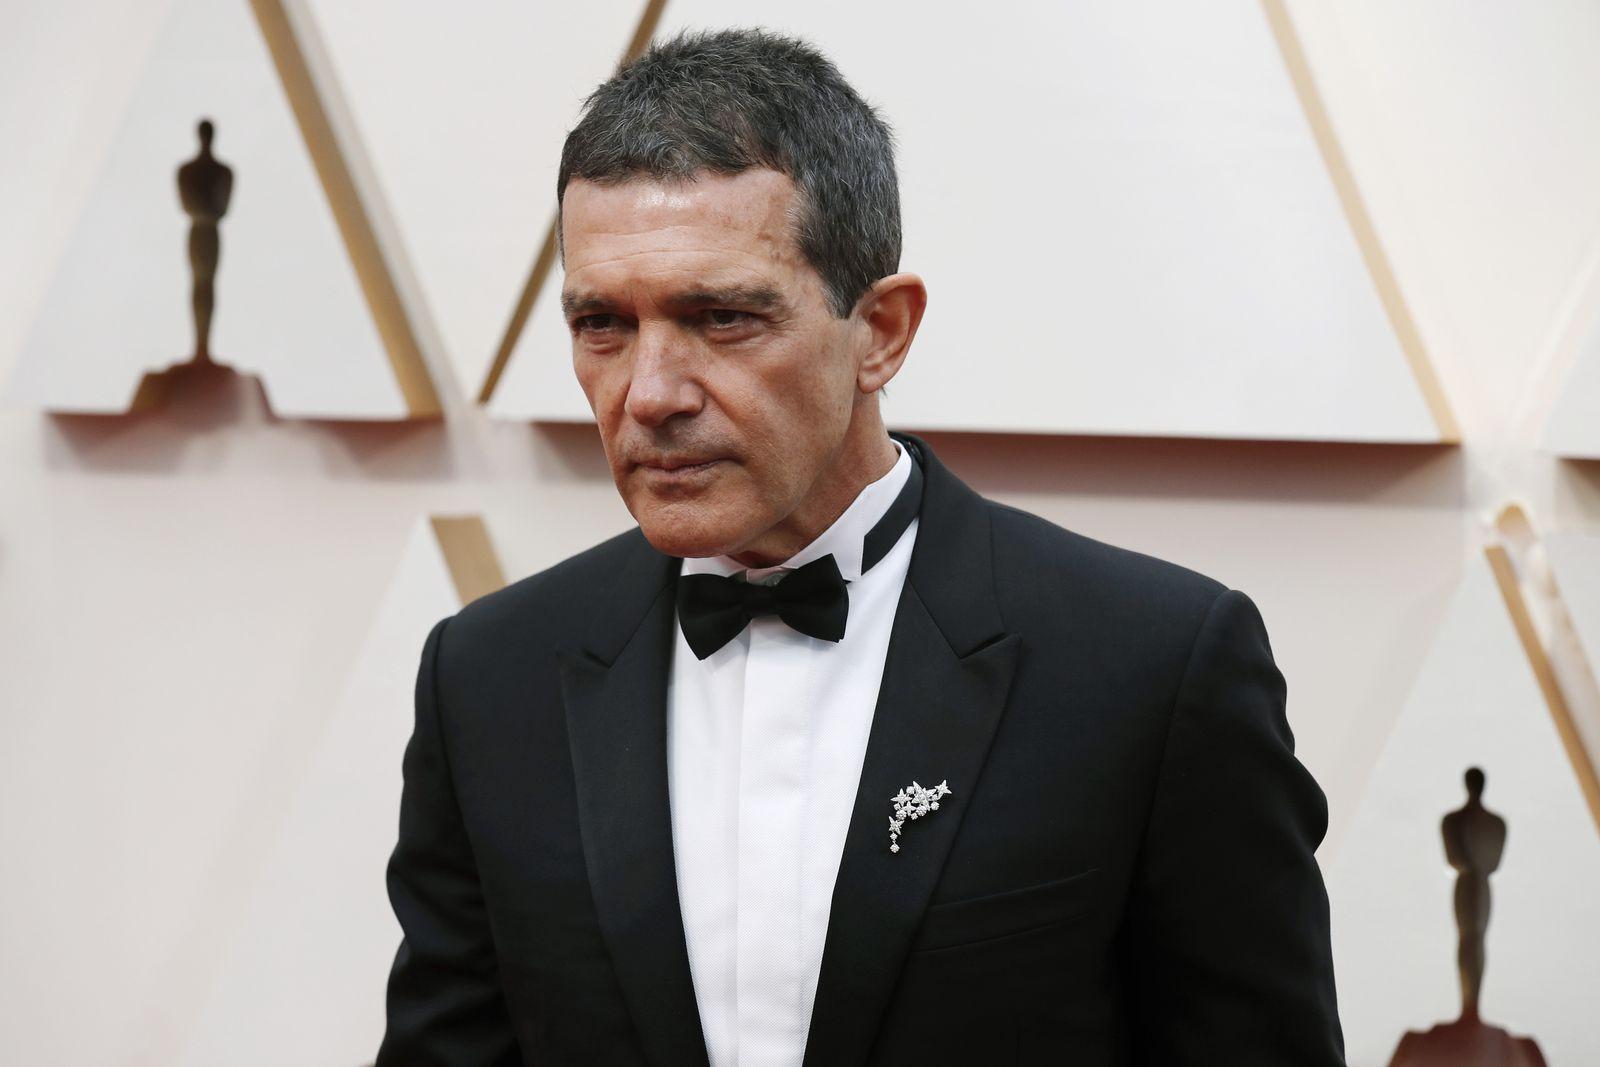 Banderas says he has tested positive for Coronavirus, Hollywood, USA - 09 Feb 2020